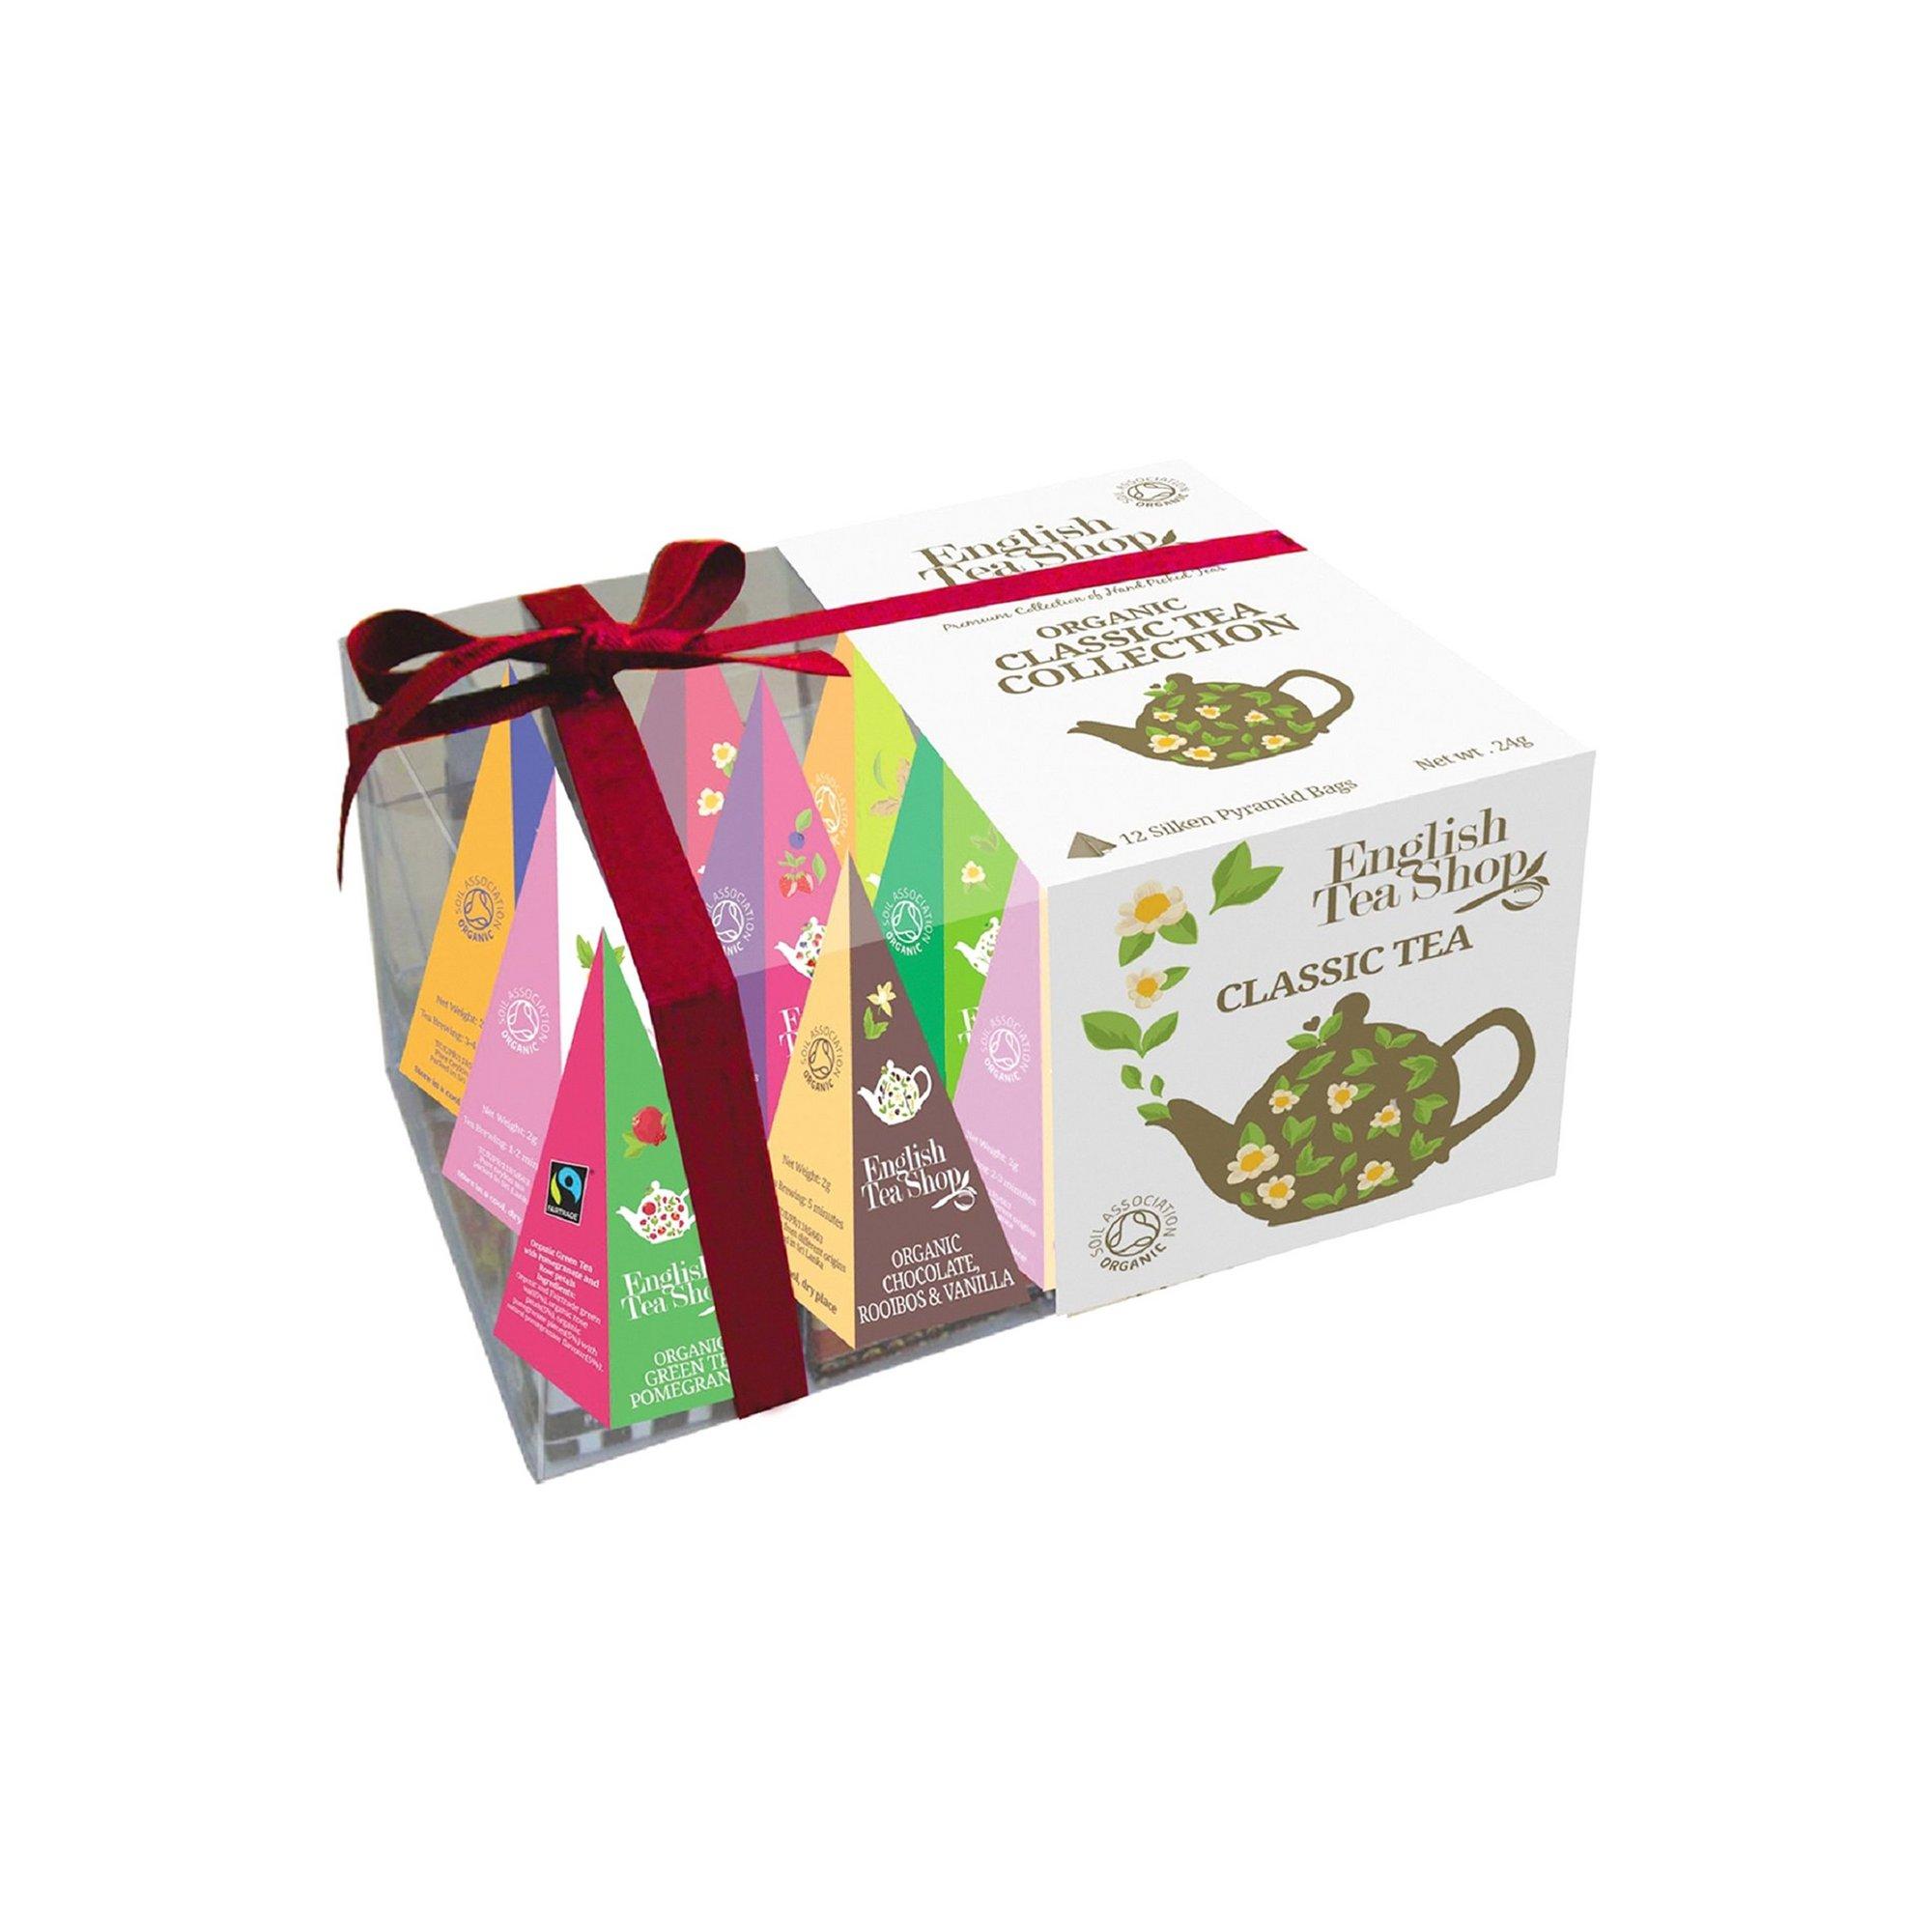 Image of English Tea Shop Organic Prism Classic Tea Collection